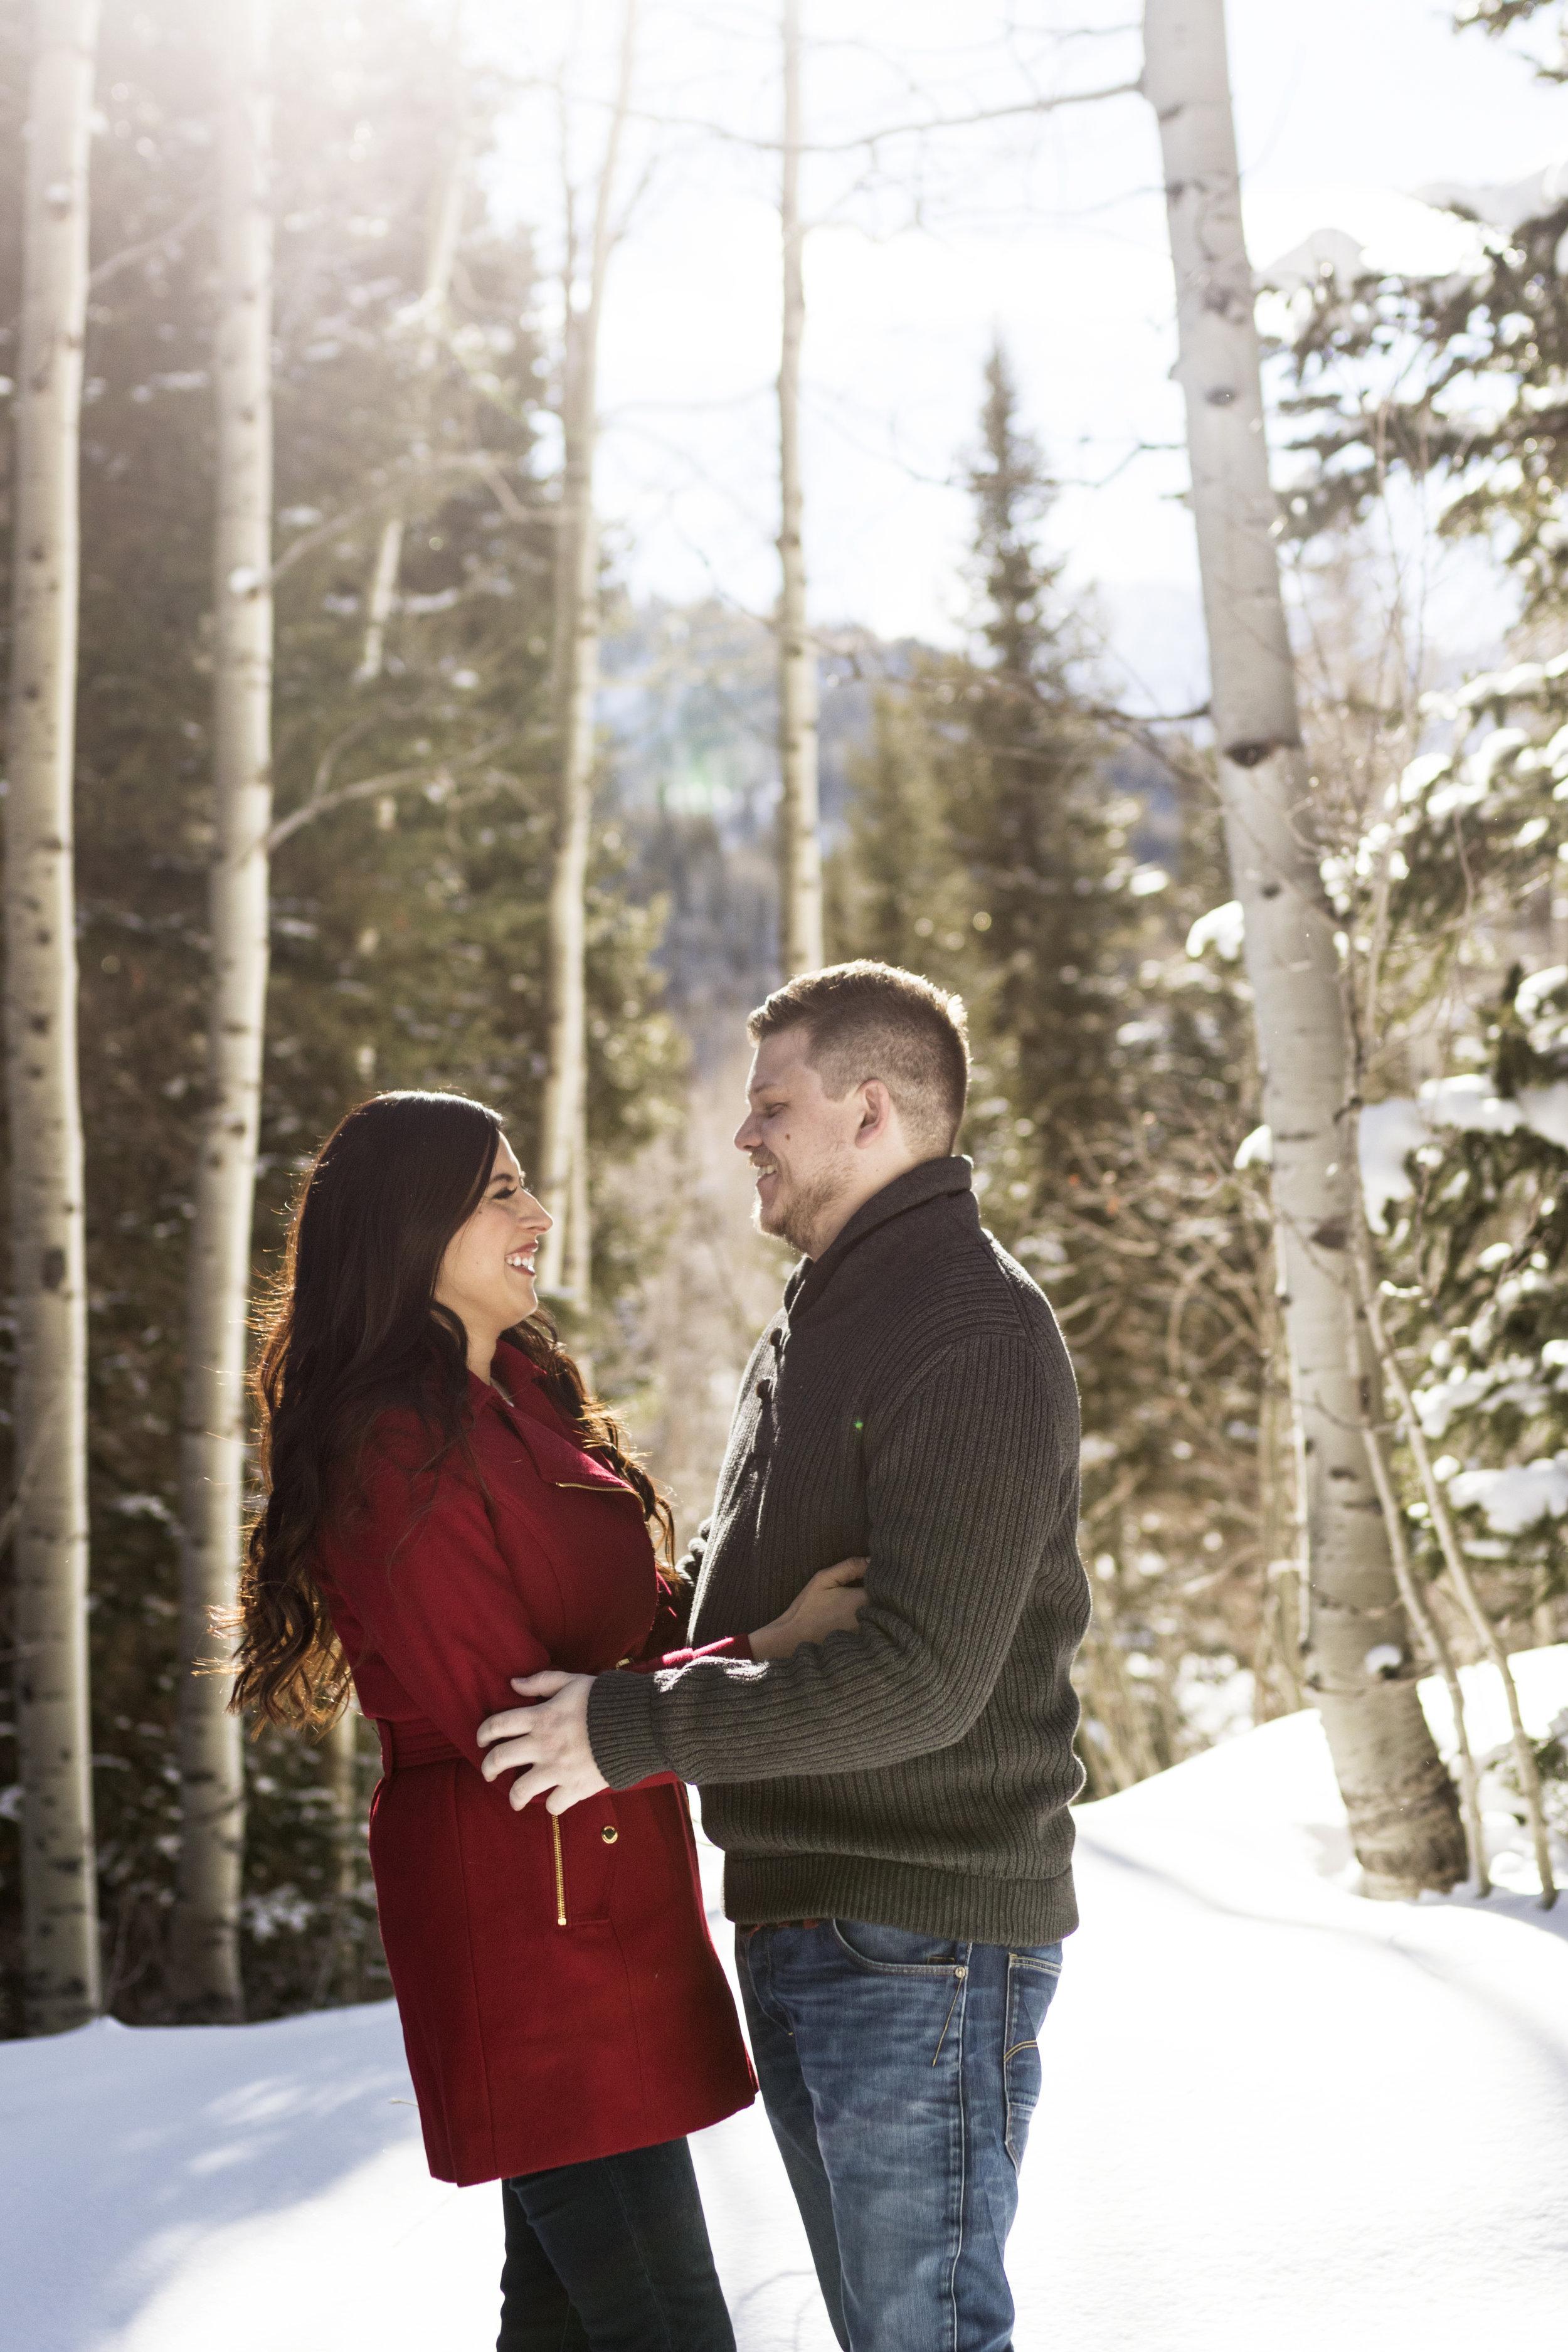 Snowey Utah Winter Engagements in Little Cottonwood Canyon by Bri Bergman Photography01.jpg